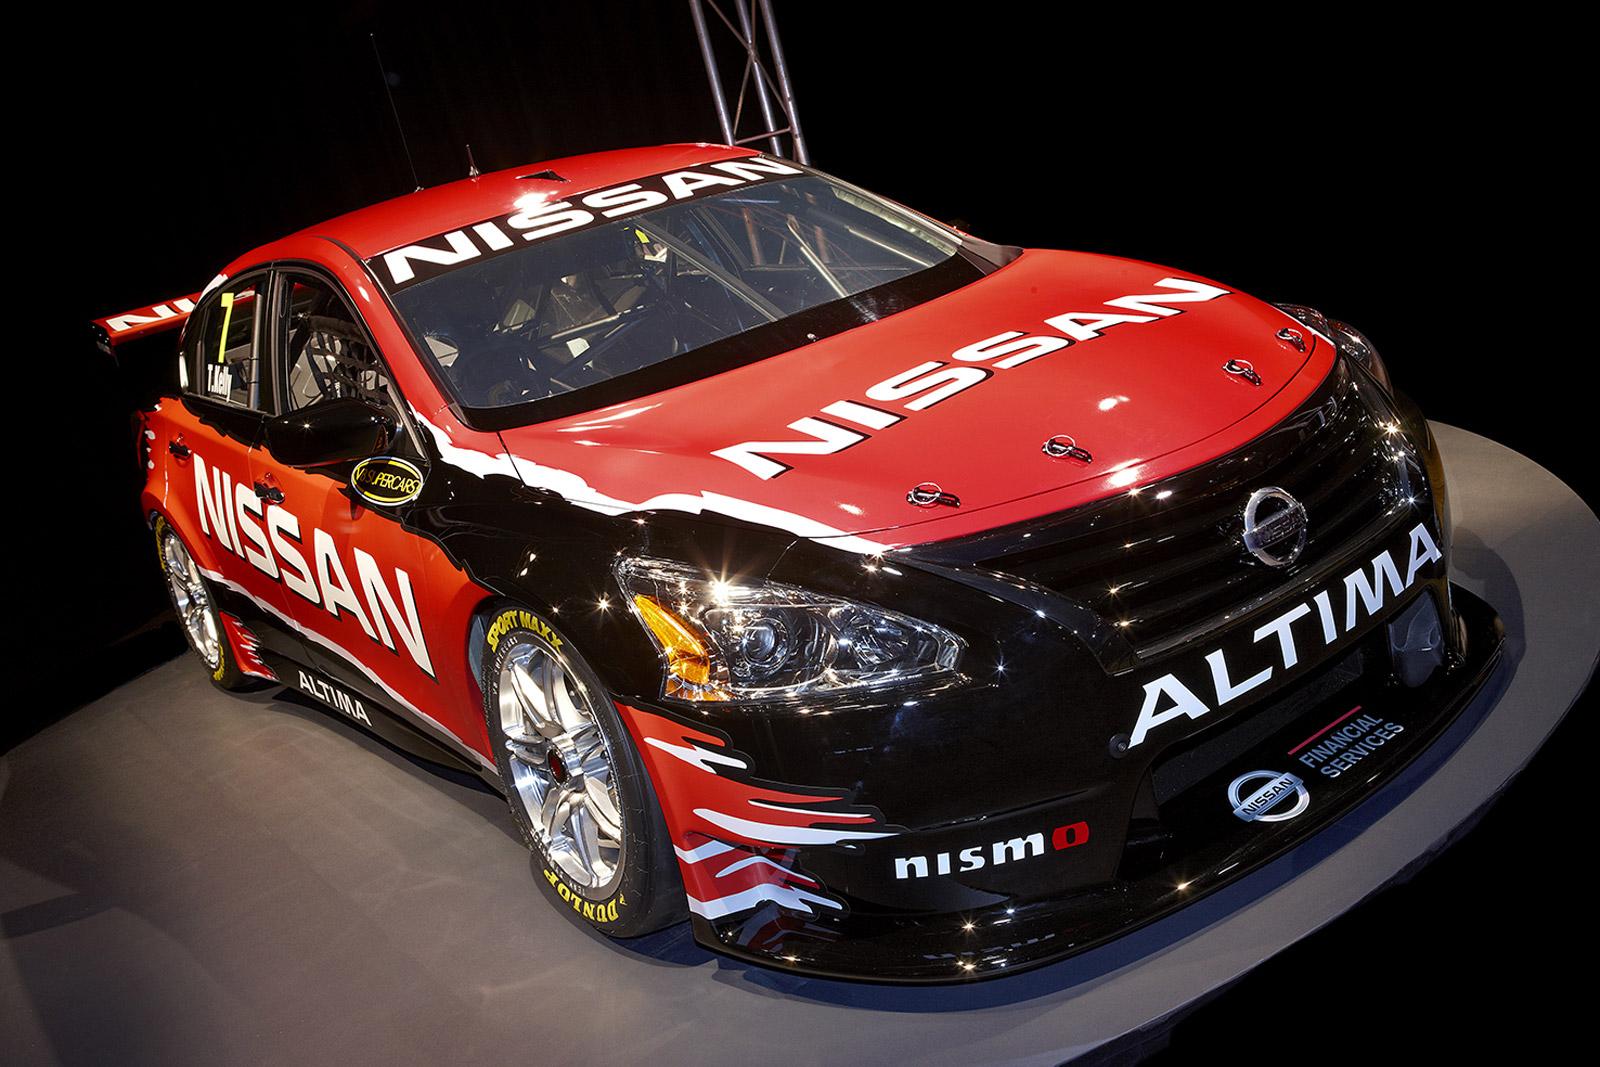 Nissan Altima V8 Supercars Race Car Revealed